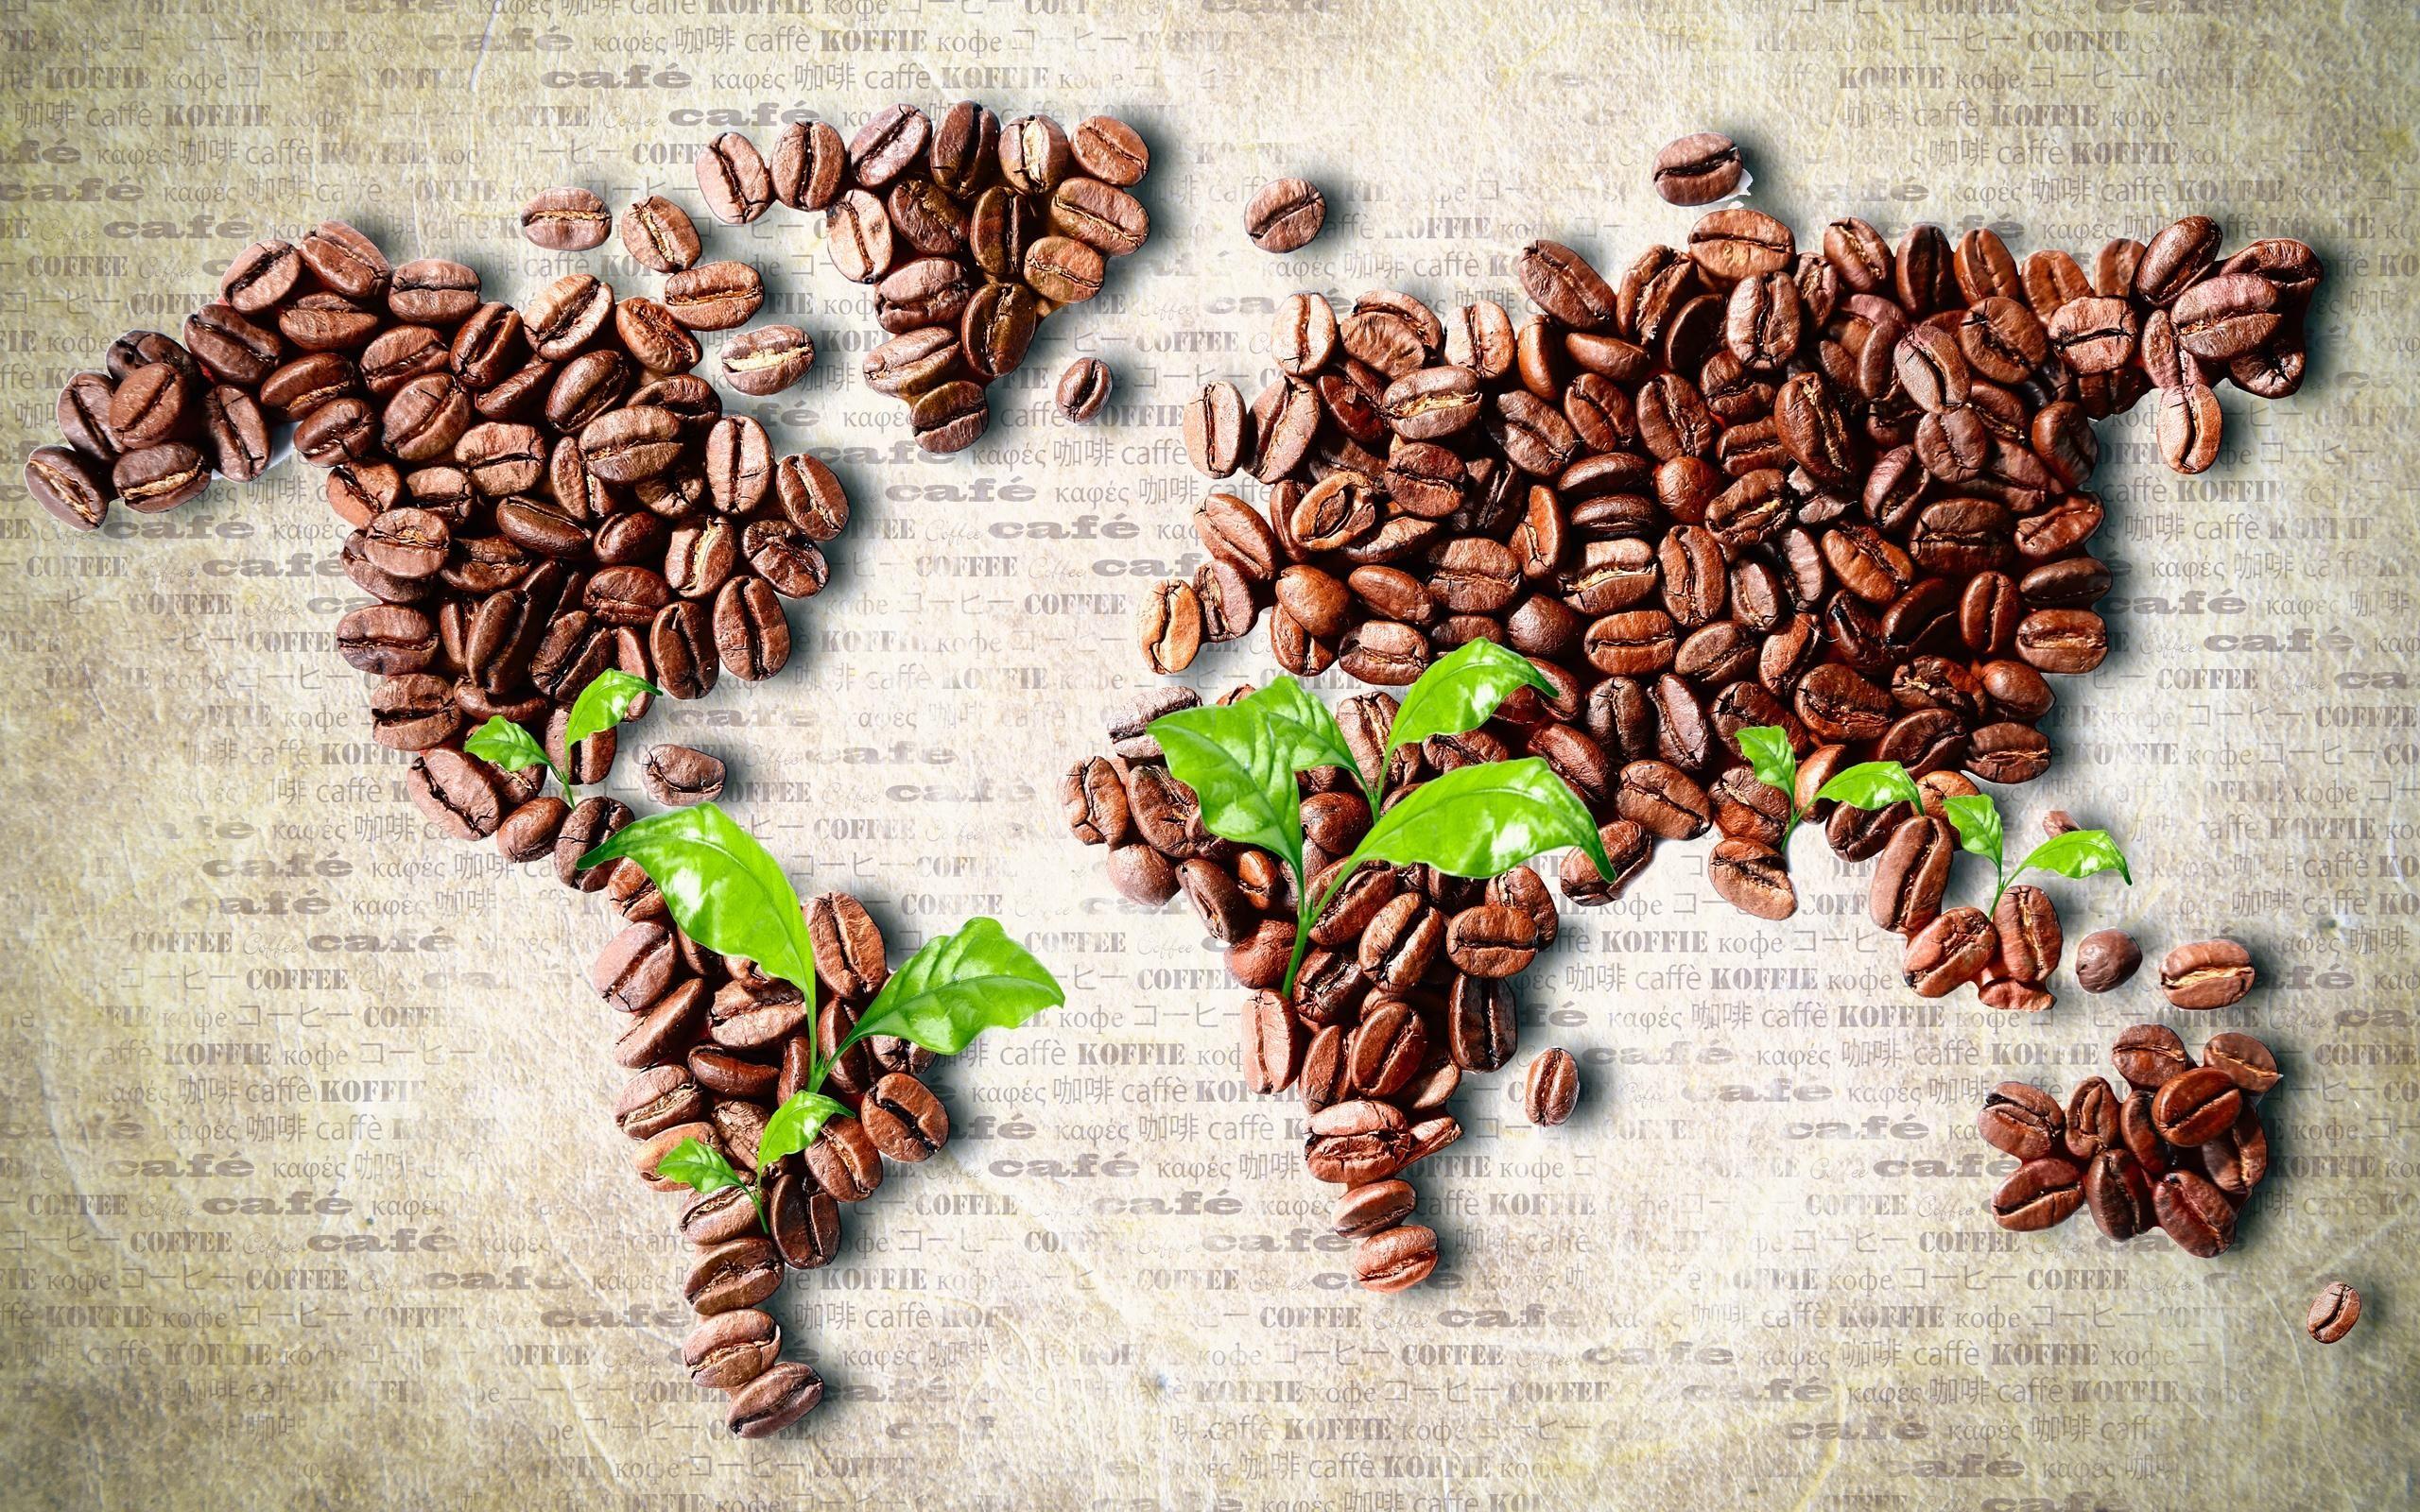 The coffee beans creative art world map 1600 x 2560 hd the coffee beans creative art world map 1600 x 2560 hd backgrounds high definition gumiabroncs Choice Image